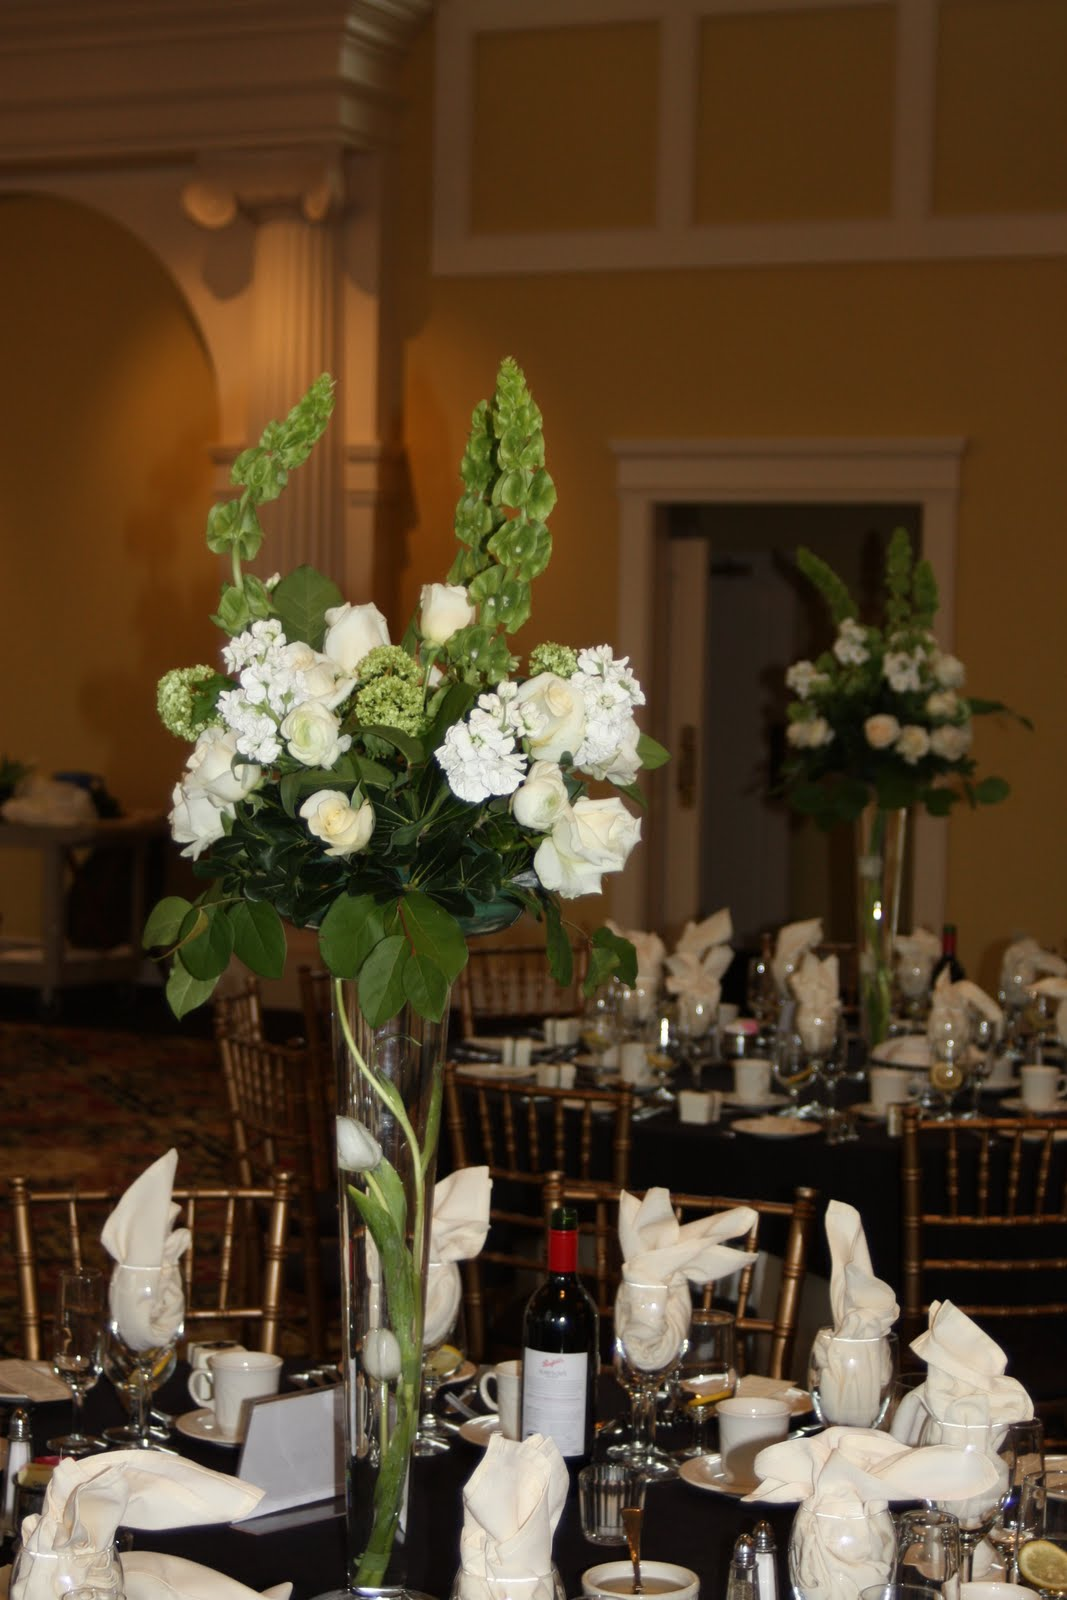 azalea floral design unique flowers for ct weddings and events june 2010. Black Bedroom Furniture Sets. Home Design Ideas